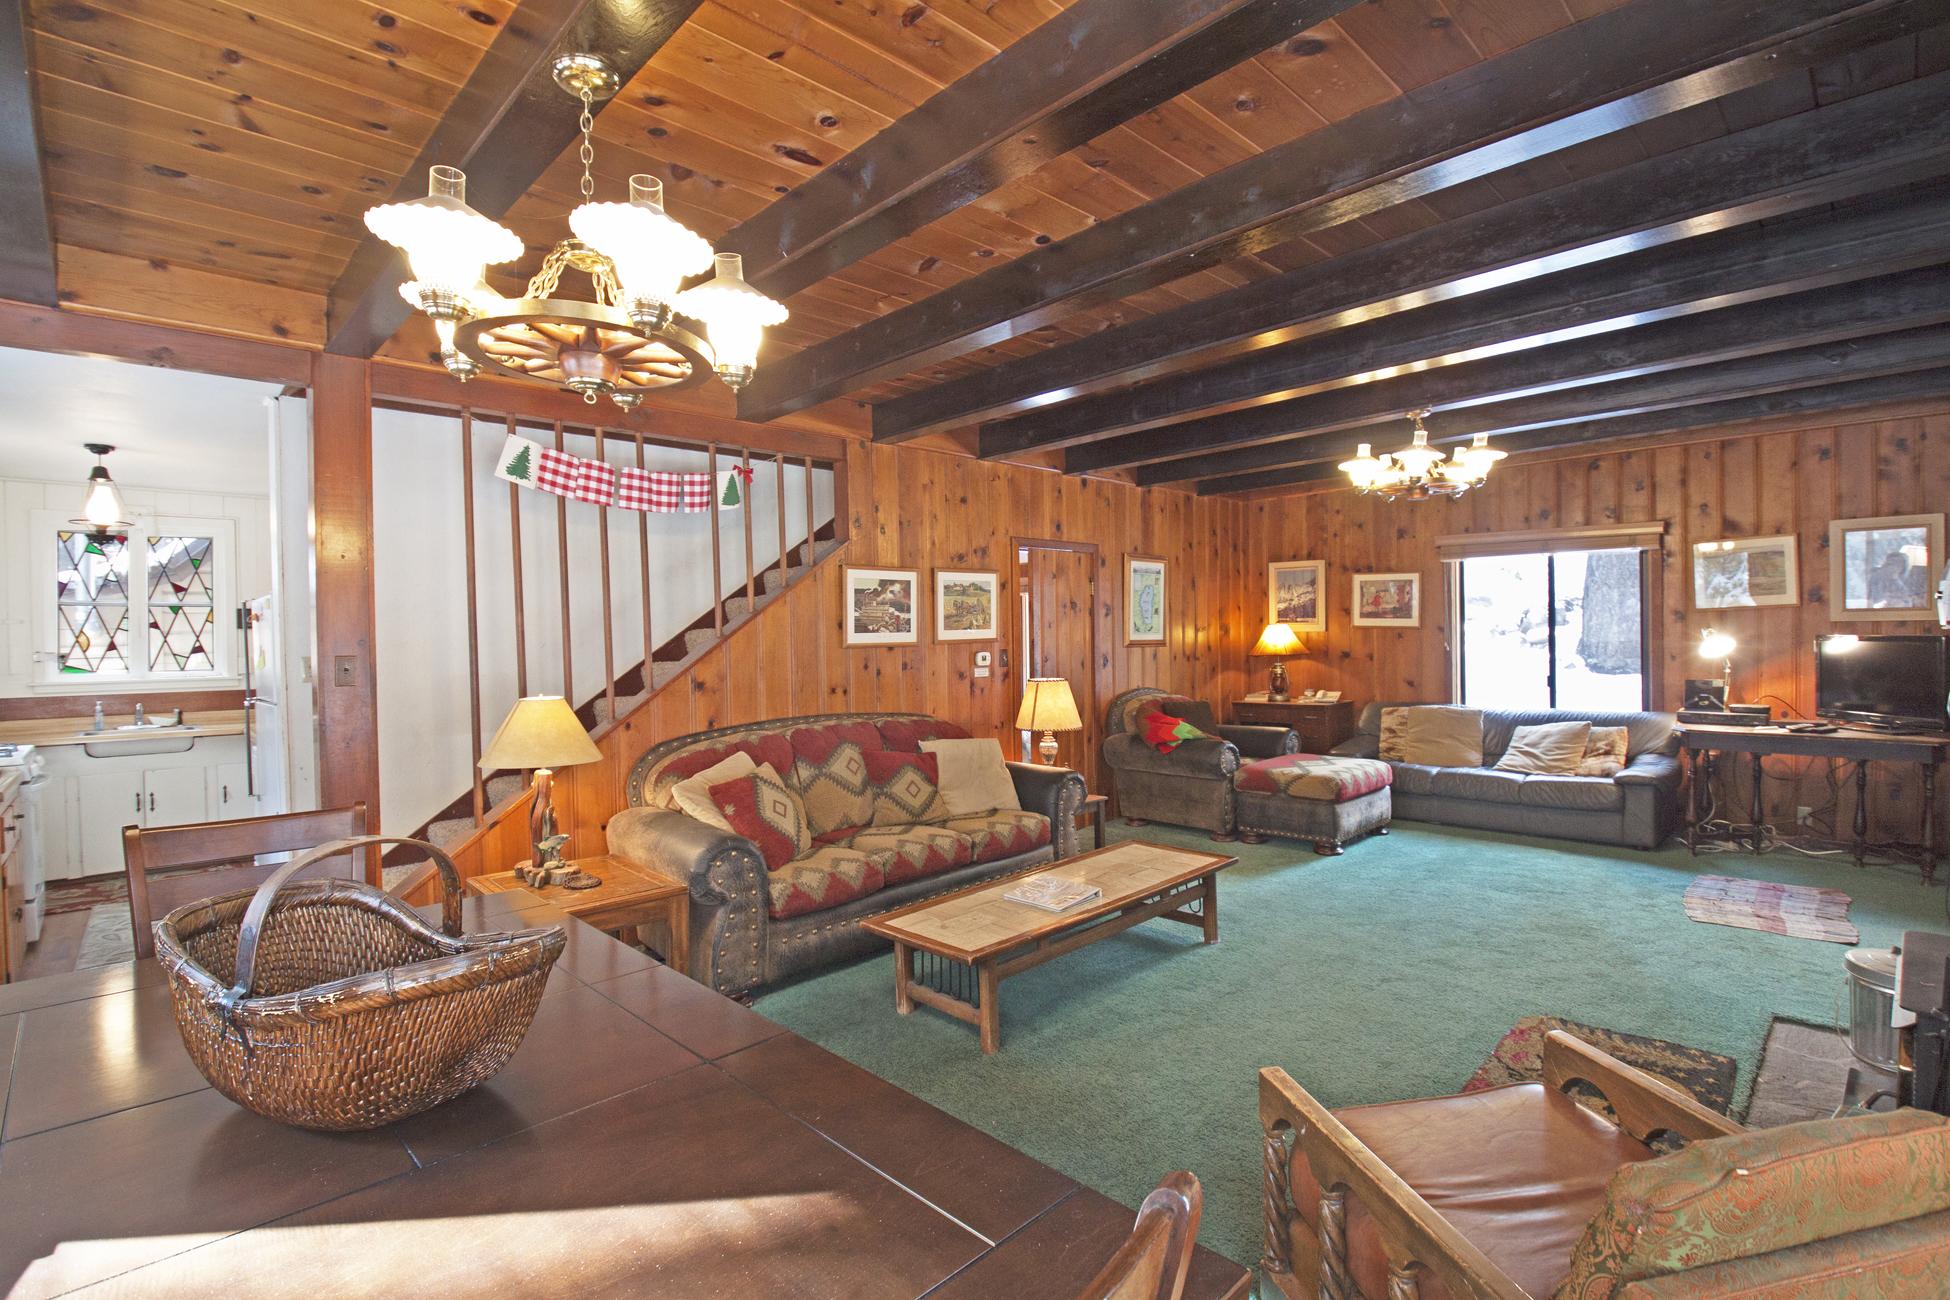 Listing Image 5 for Quandt Cabin